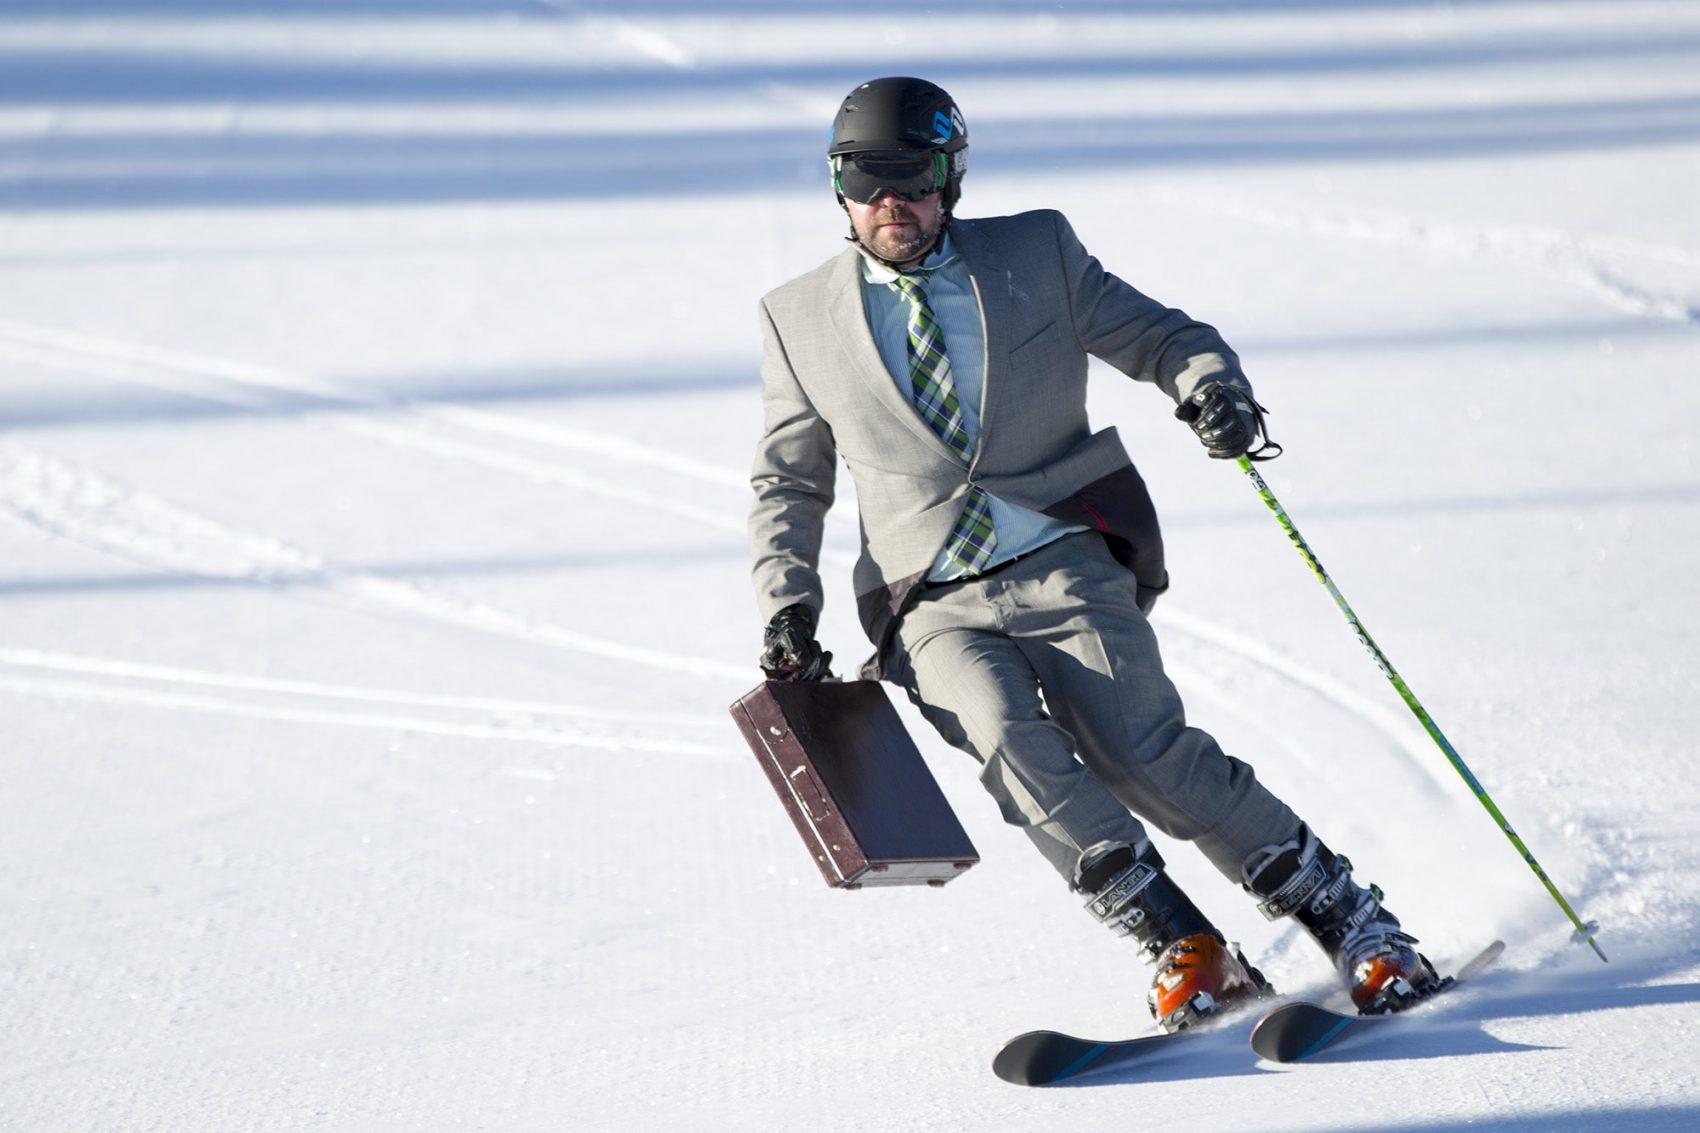 Business man skiing